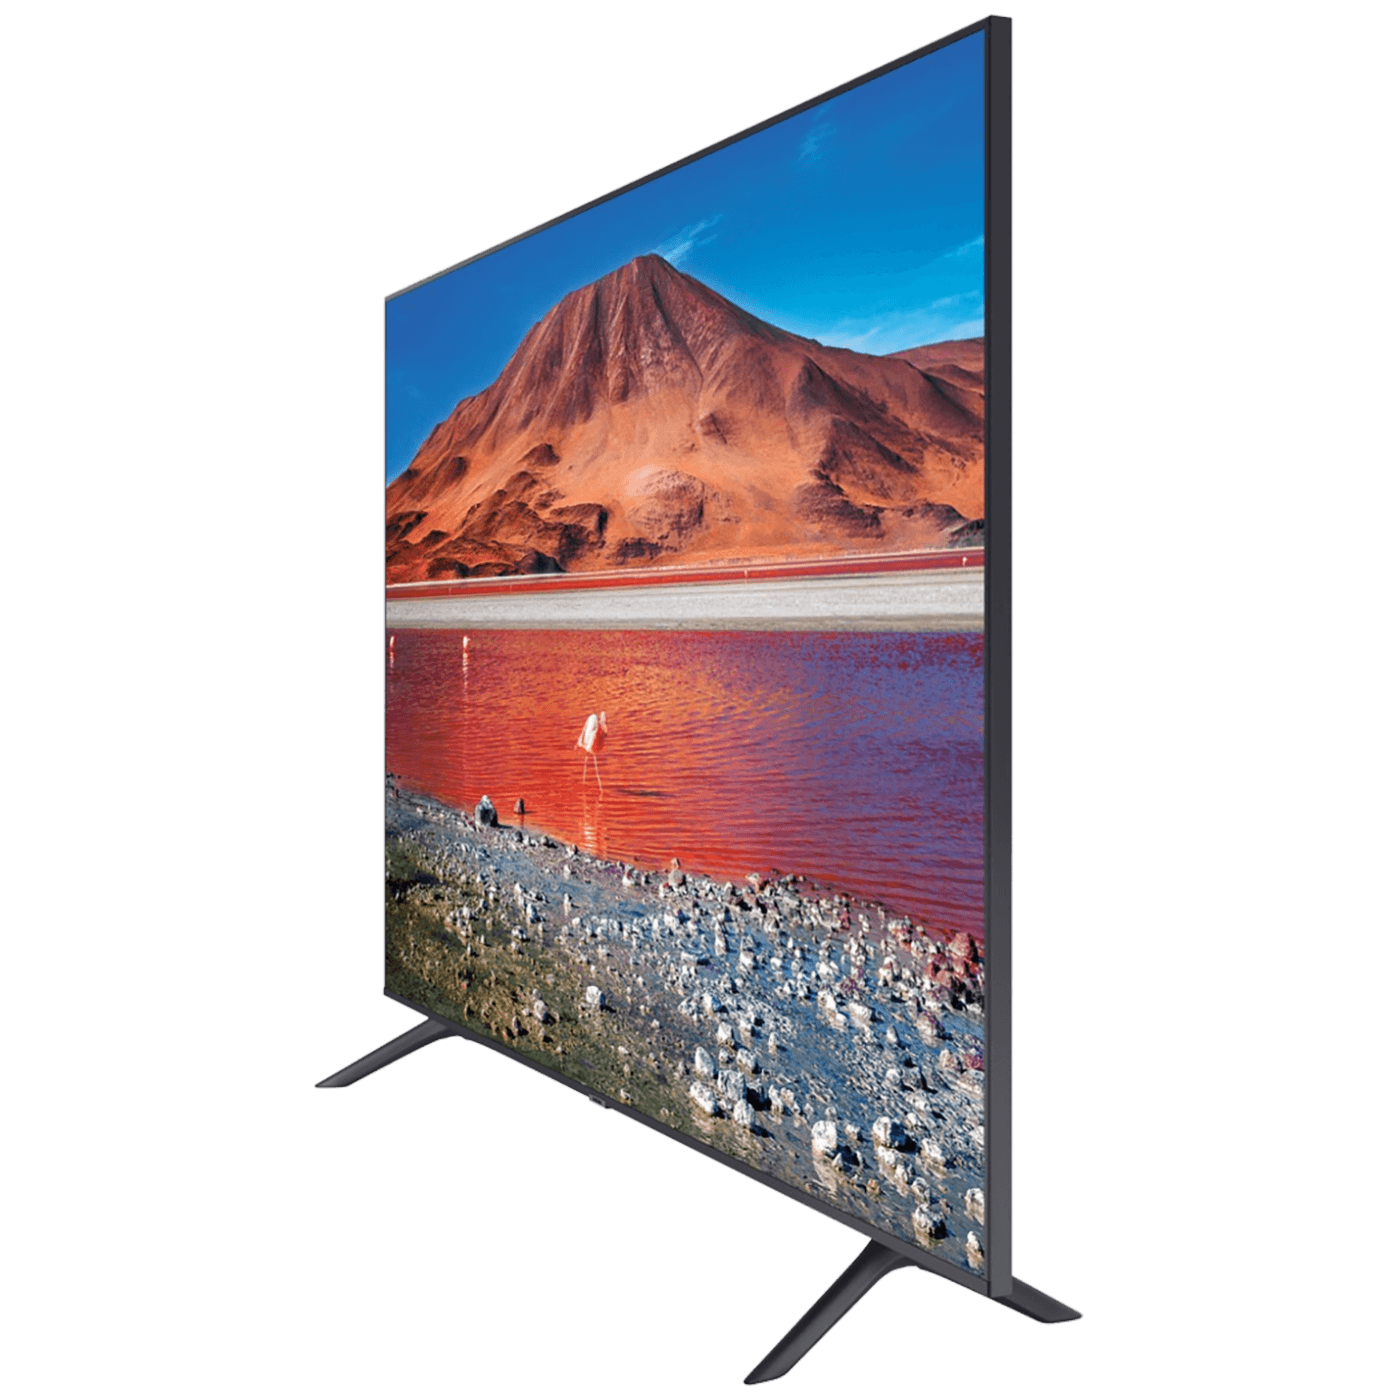 Smart 4K LED TV 75